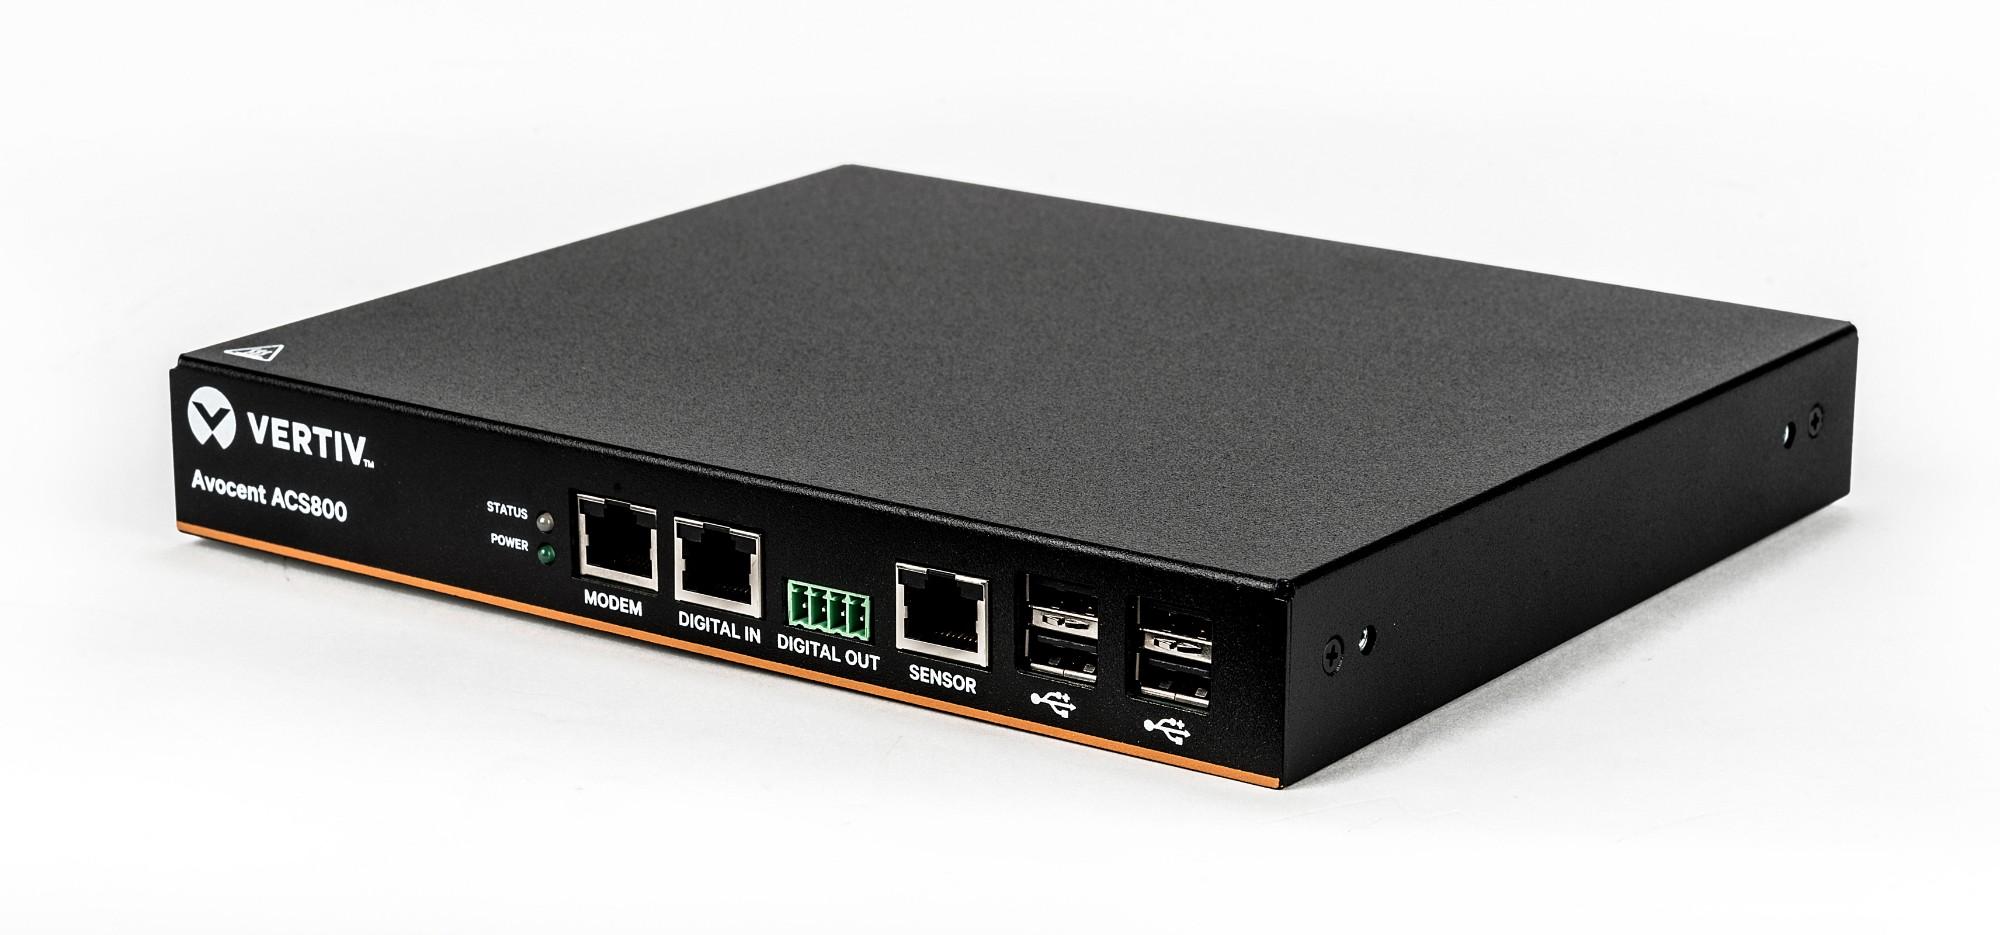 Vertiv Avocent 4-Port ACS800 Serial Console with analog modem, external AC/DC Power Brick - UK power